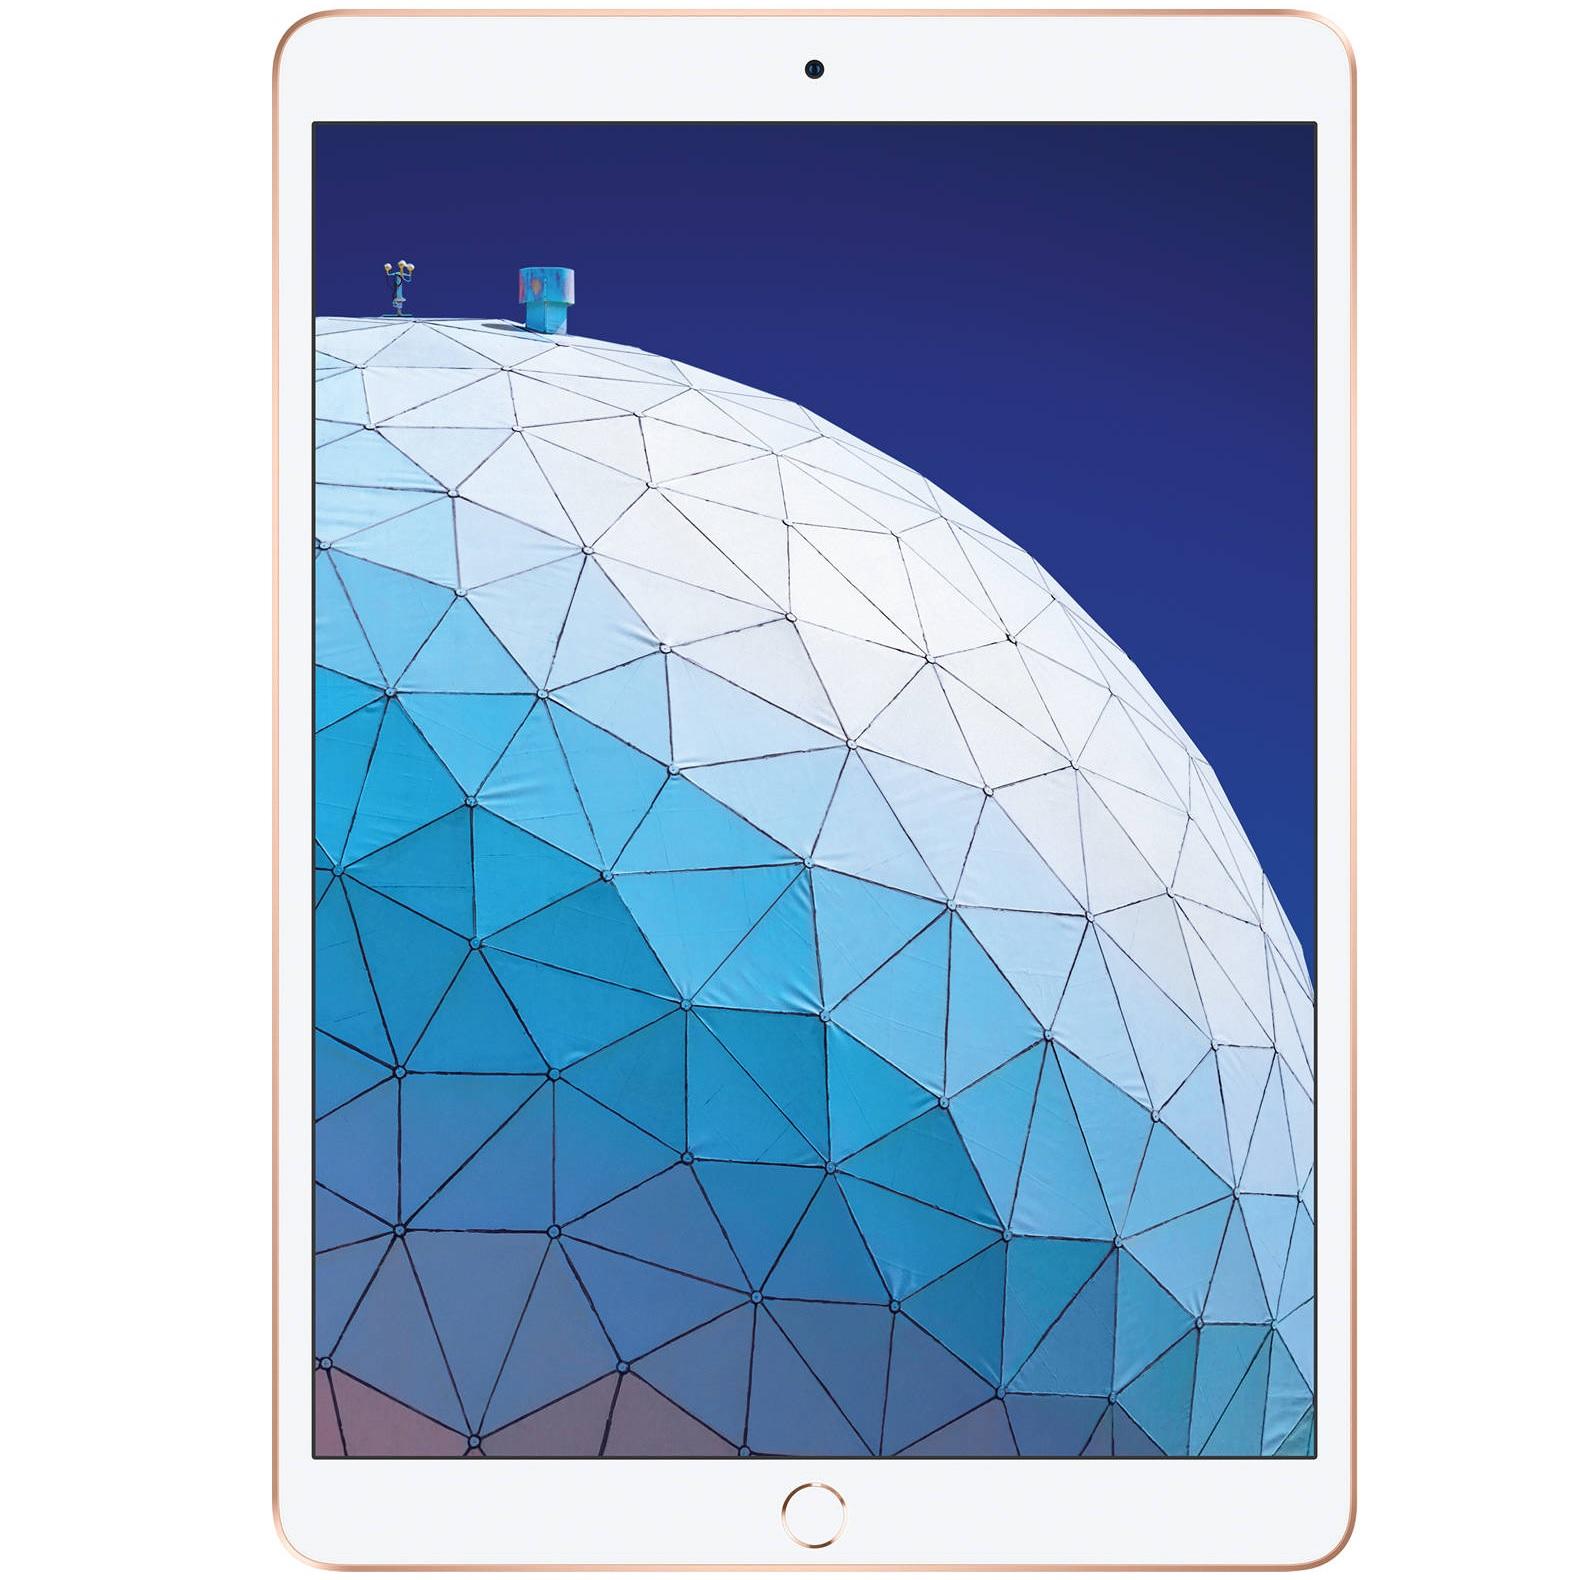 تبلت اپل مدل iPad Air 2019 10.5 inch WiFi ظرفیت 256 گیگابایت